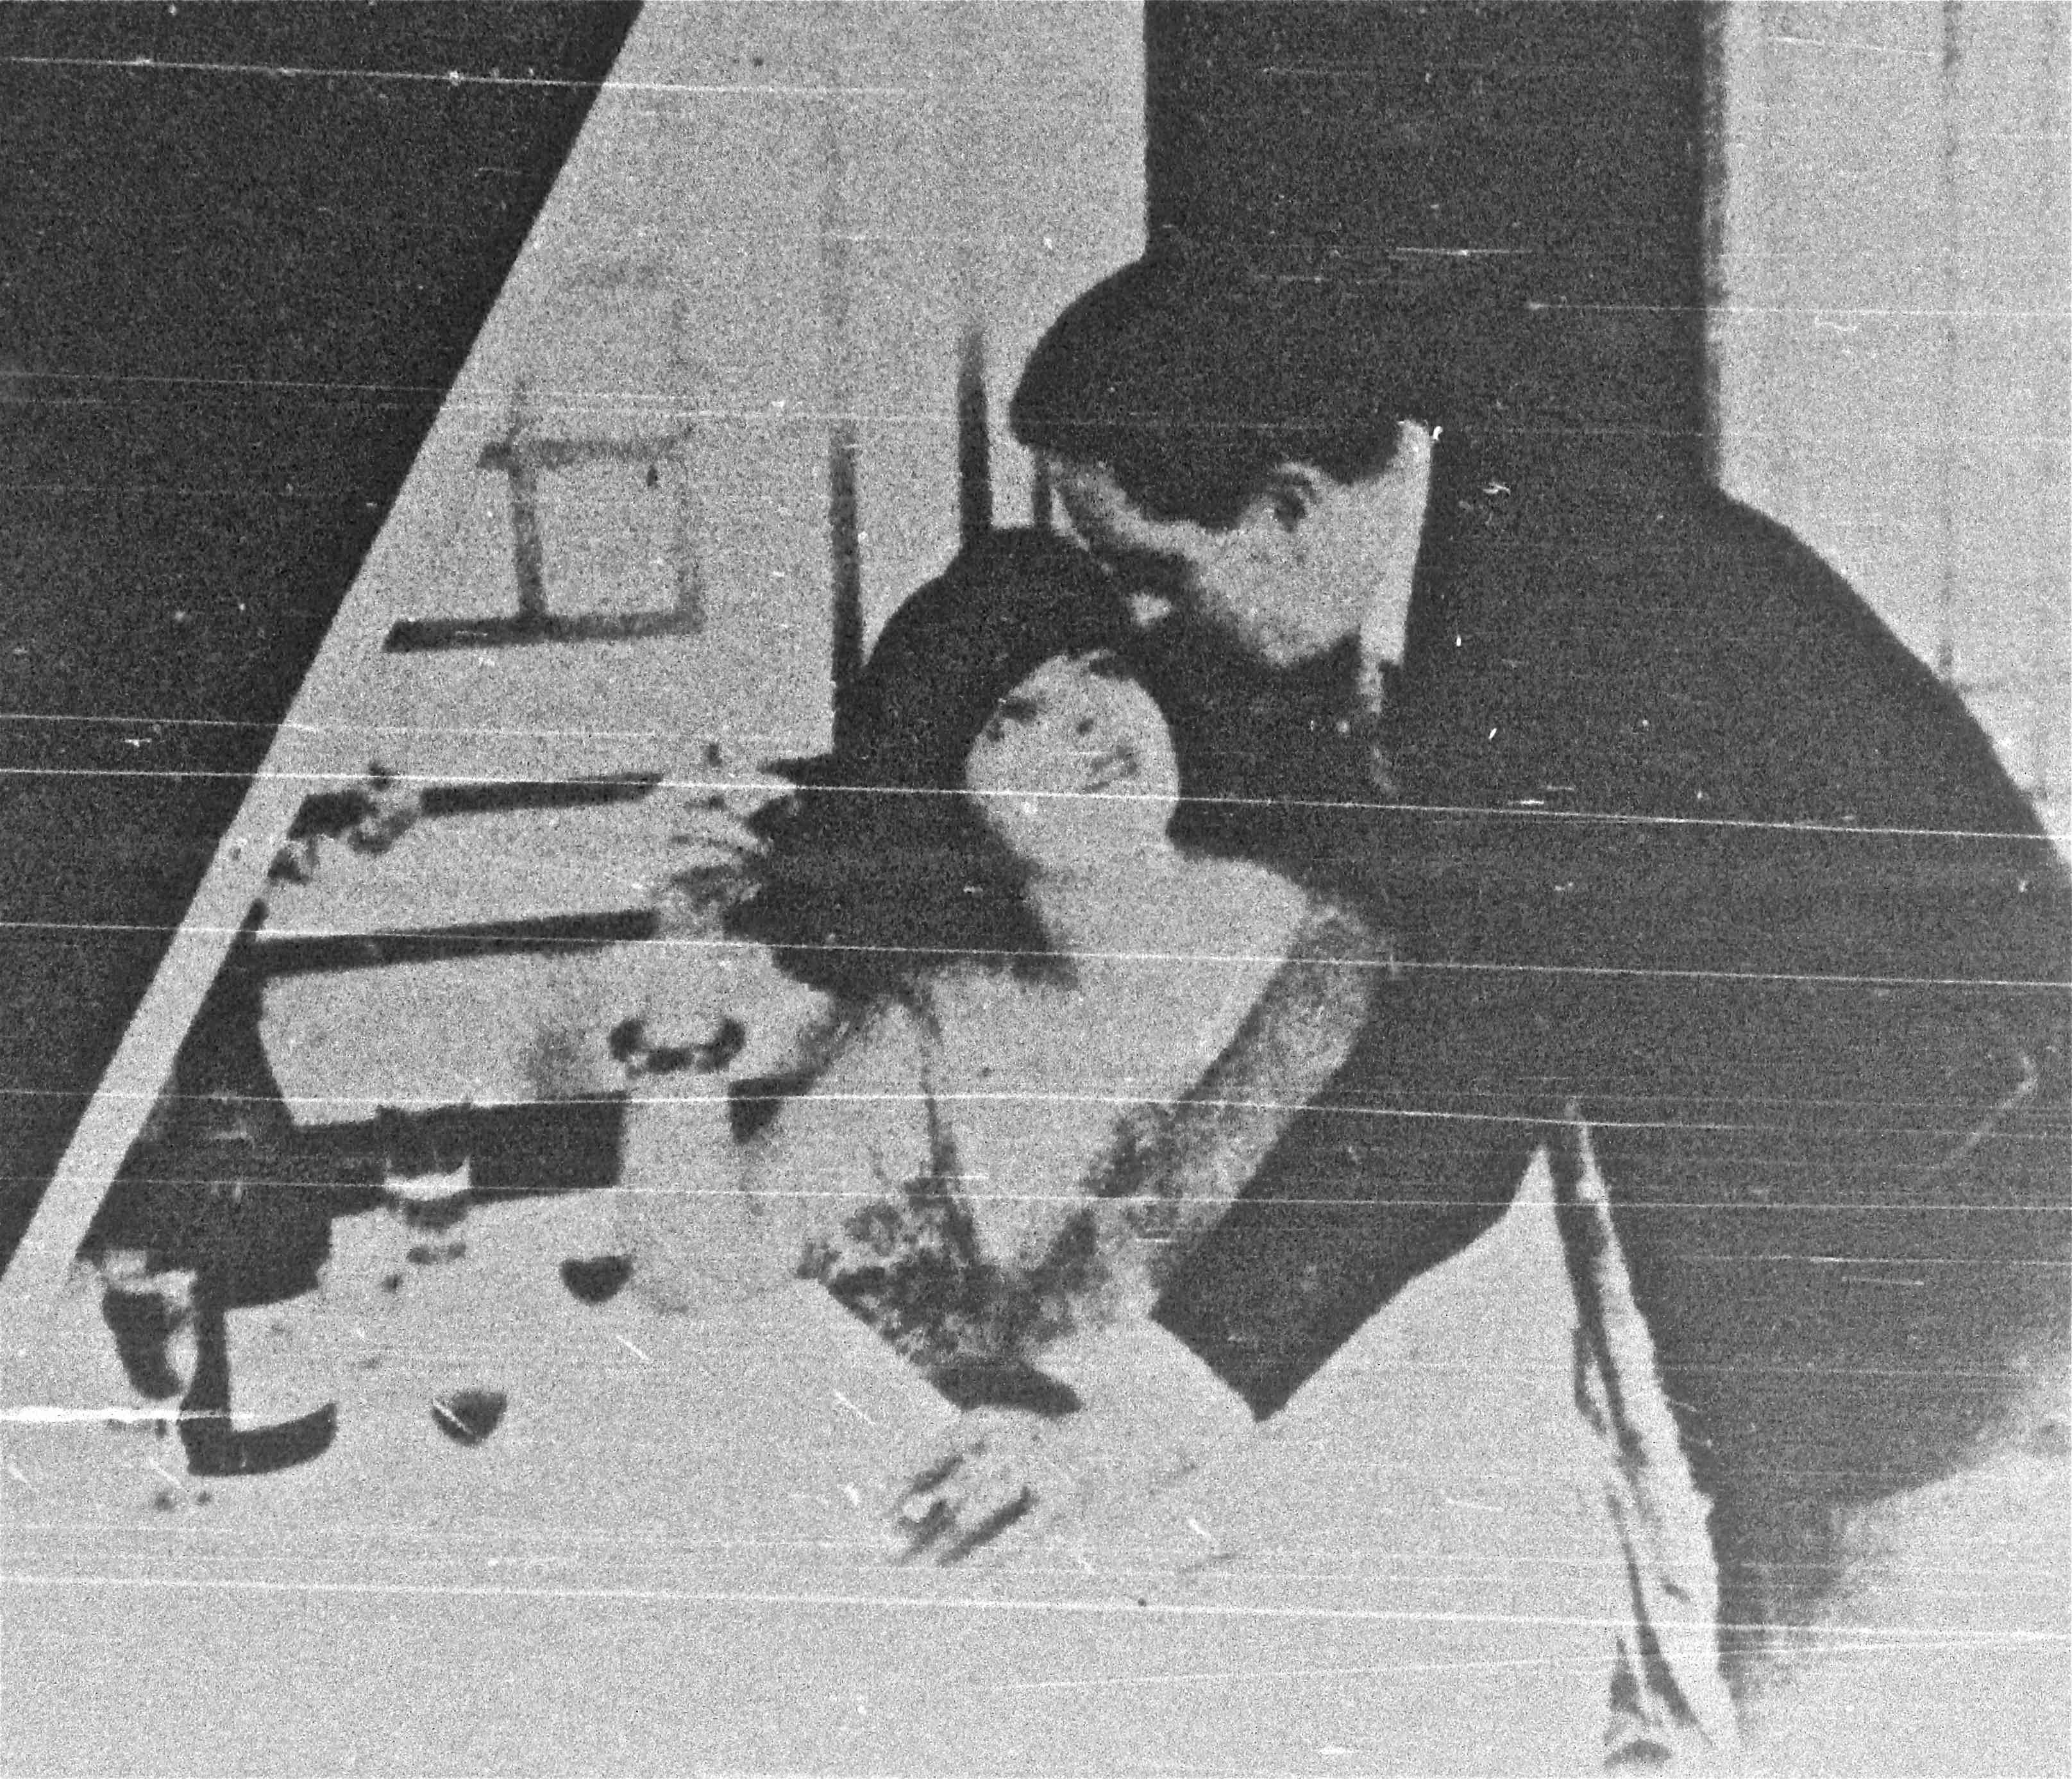 19240712_zigzagF3_stgo_golondrina_cabaret_baja.jpg